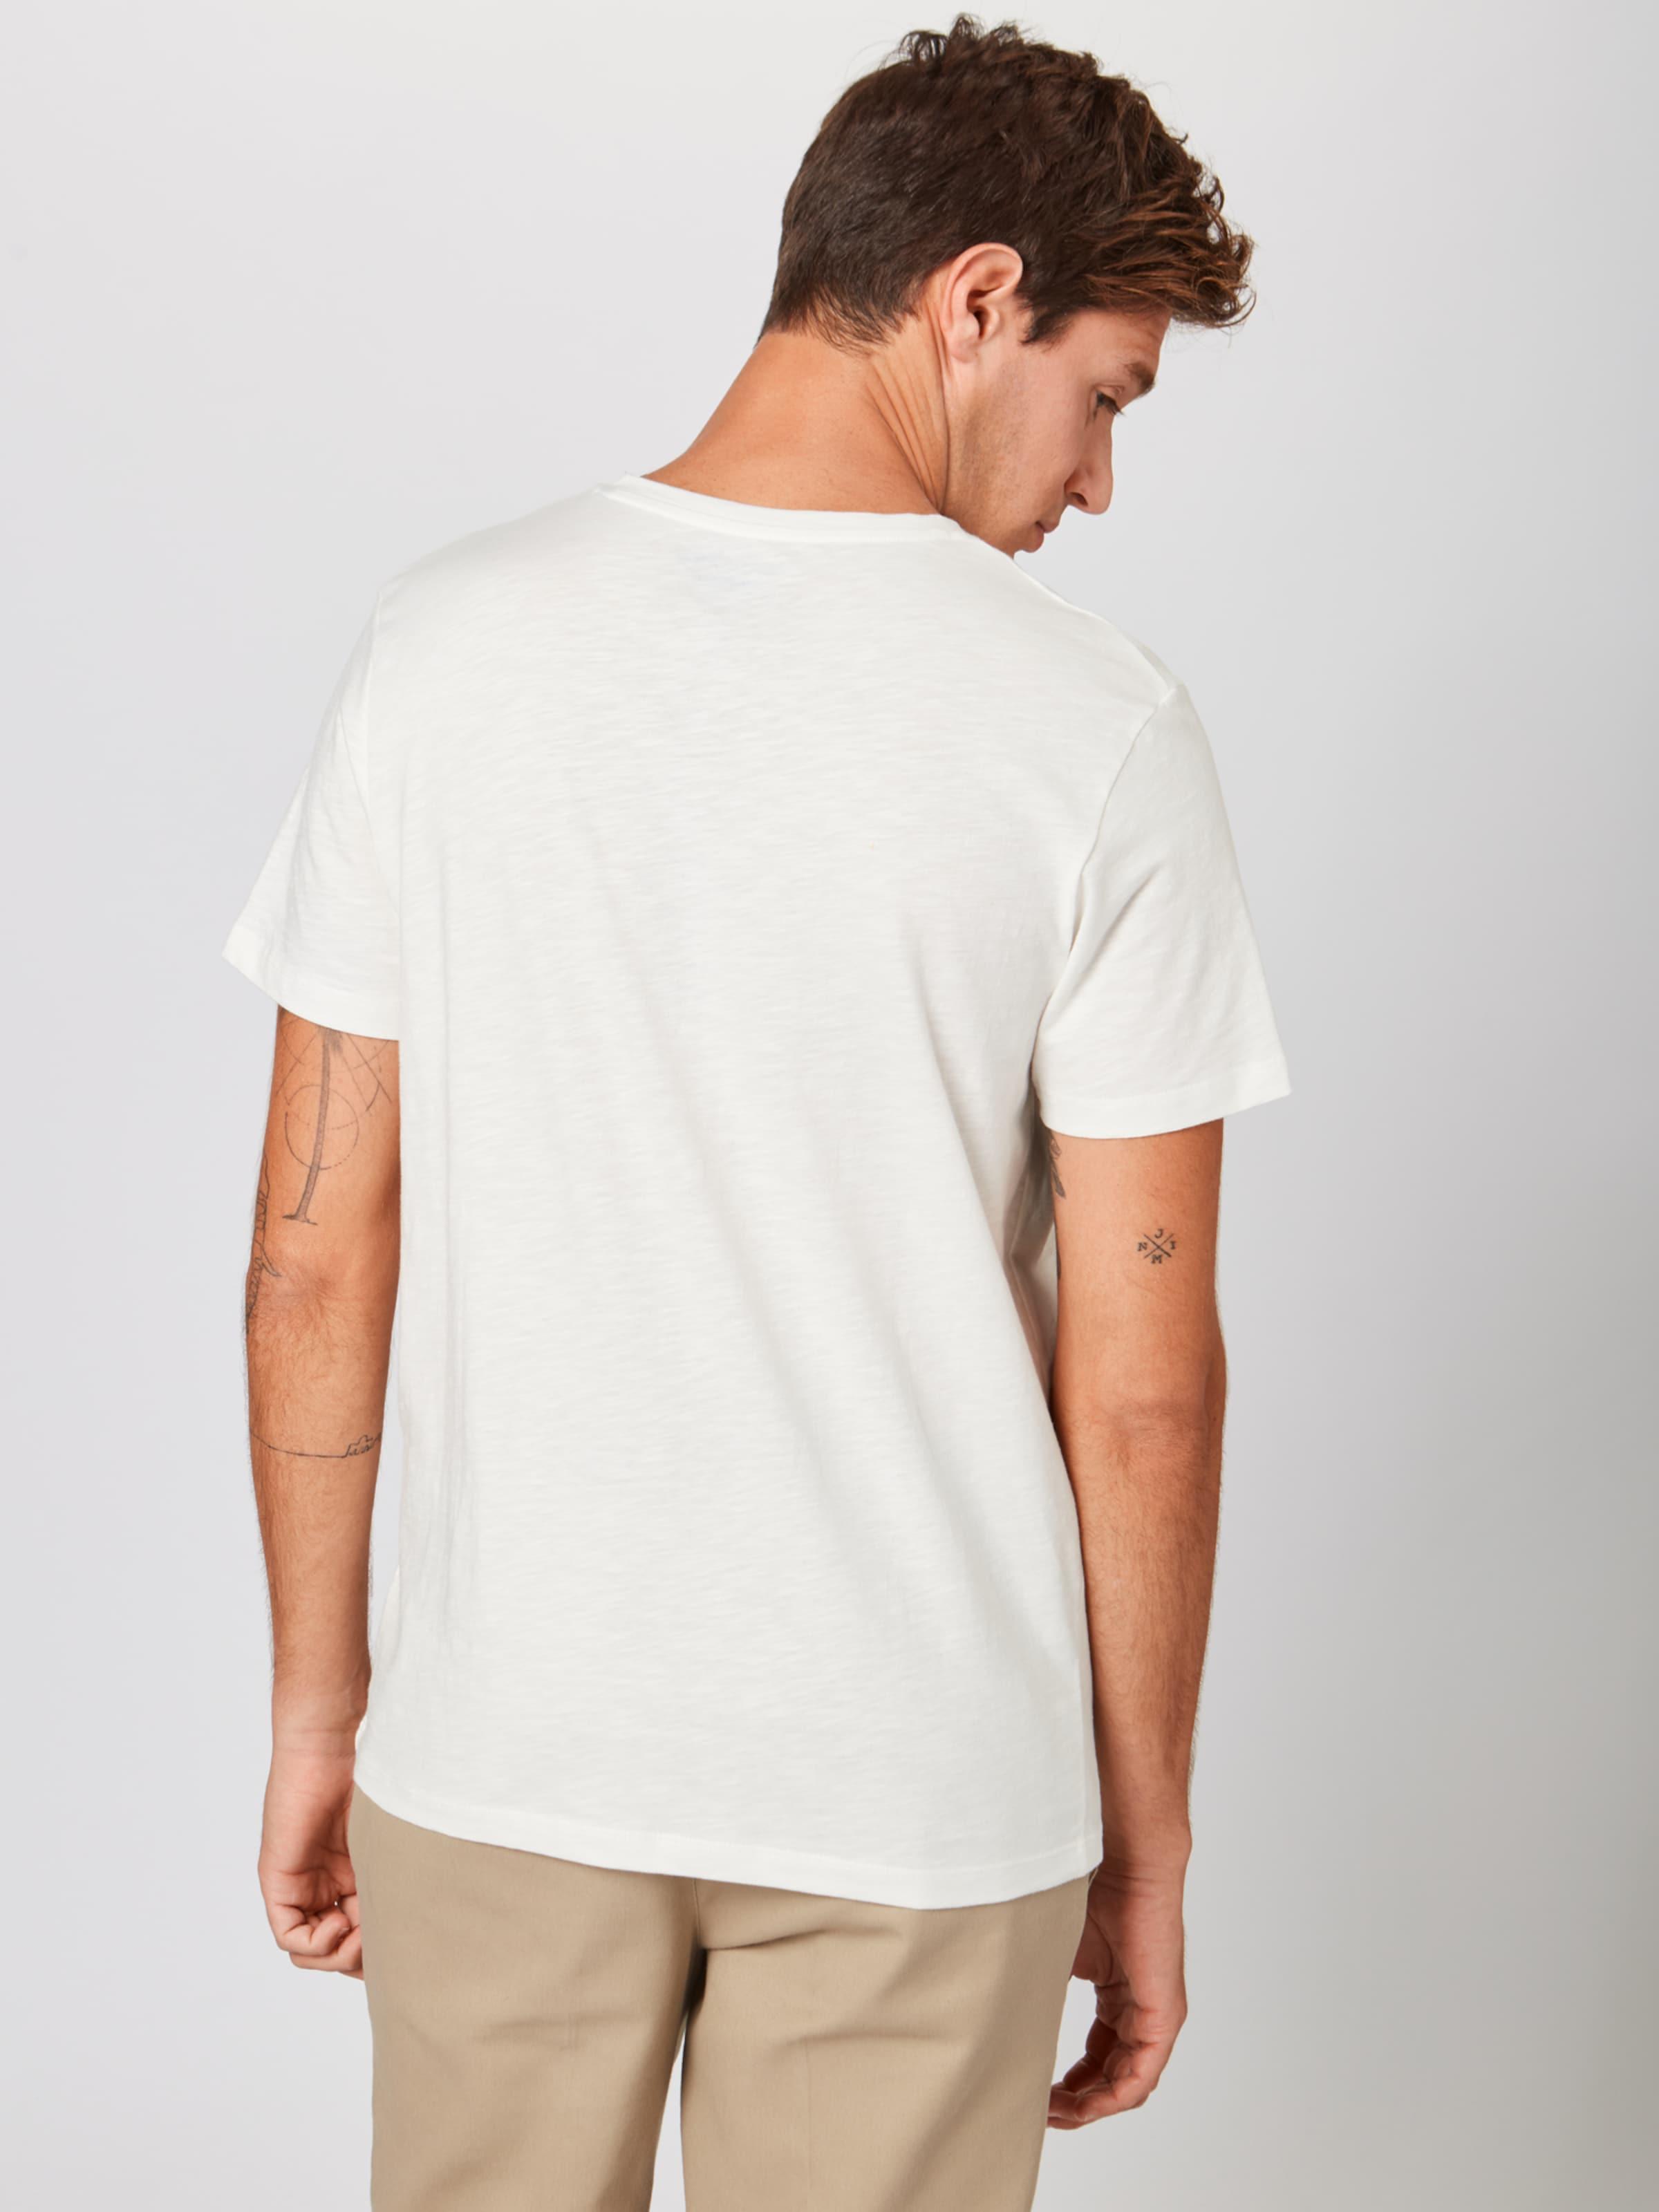 Jones BleuGris En Chiné T shirt Jackamp; tdhQCrs